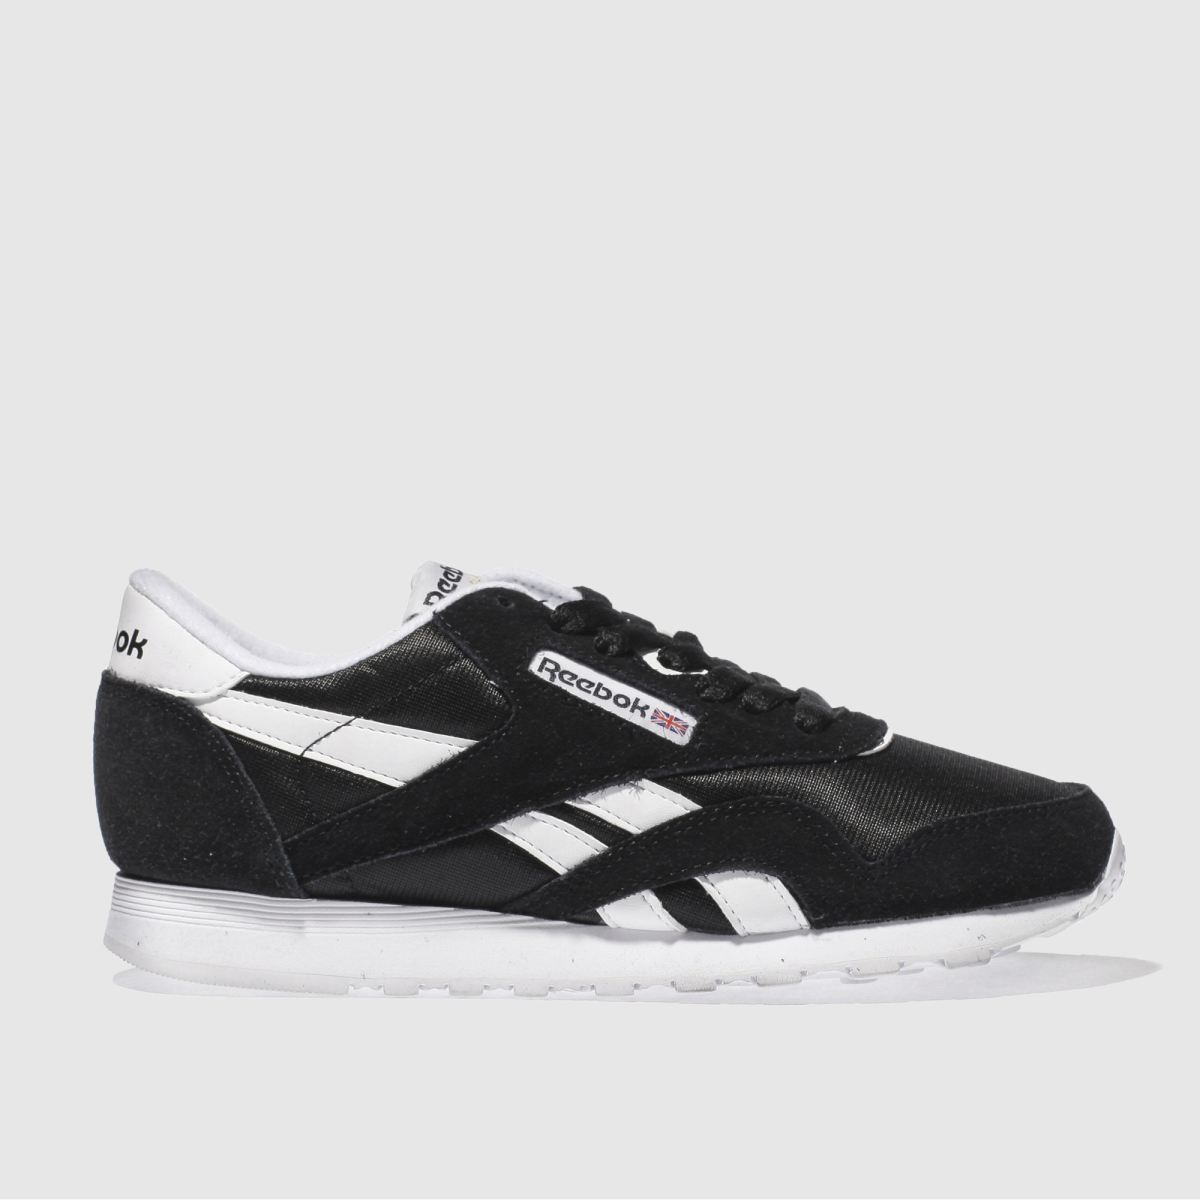 Reebok Black & White Classic Nylon Trainers